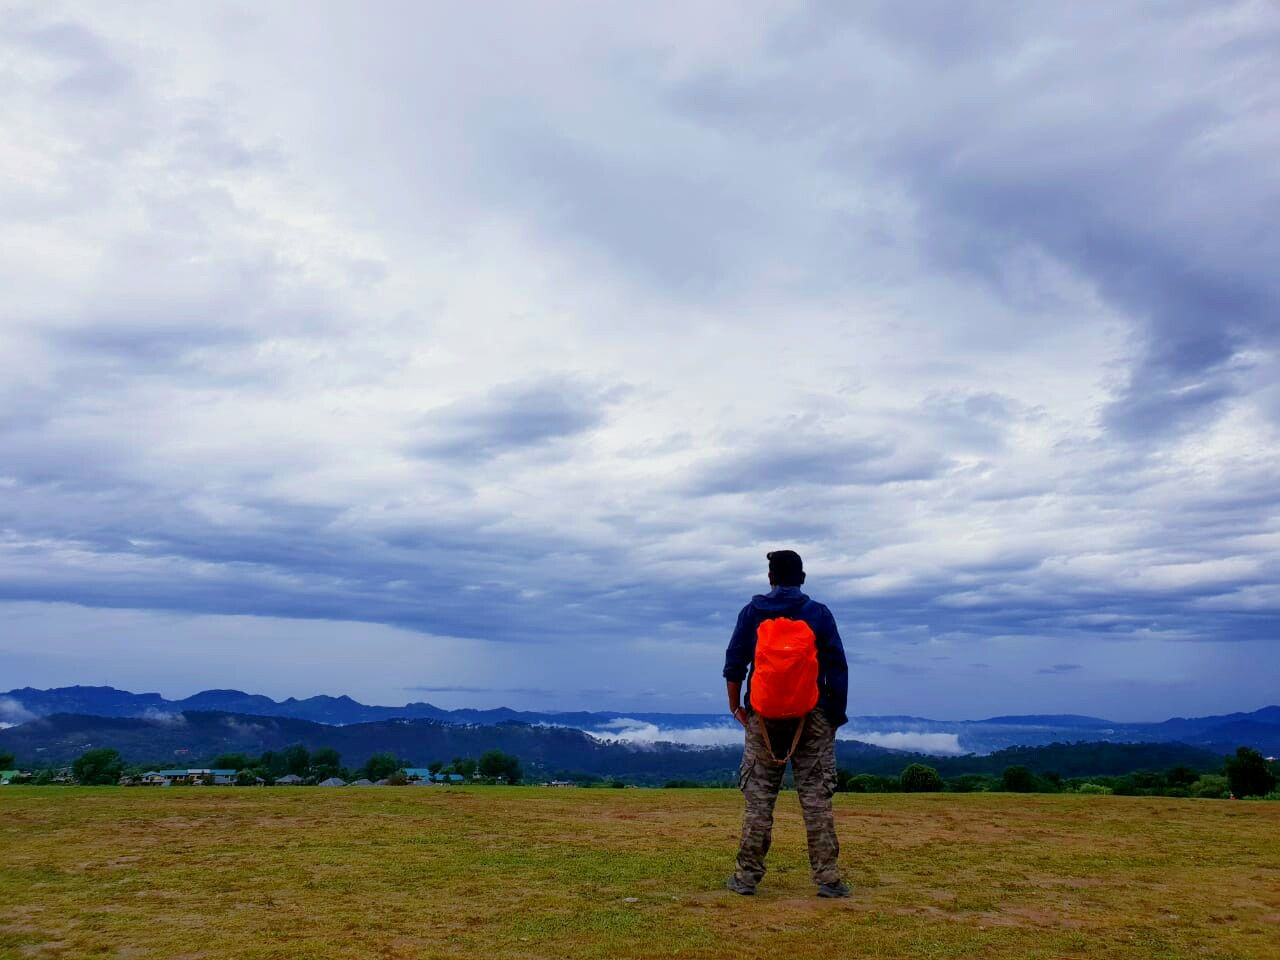 Photo of Bir By Swayam Prabha Tripathy